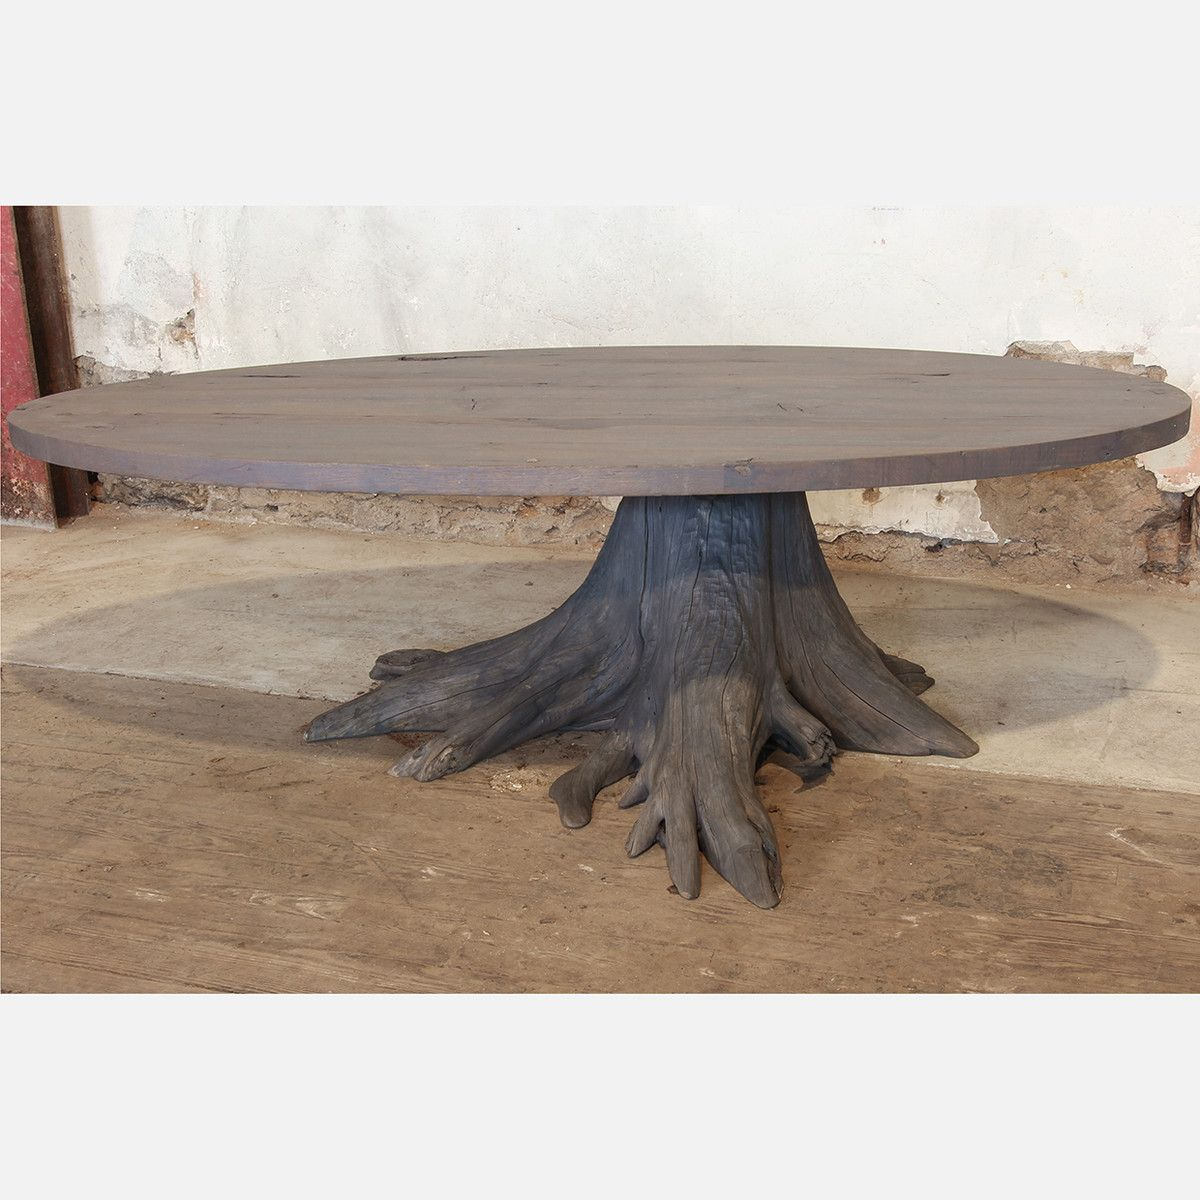 Einfaches wohnmöbel design stained oak table  outdoors  pinterest  kunst